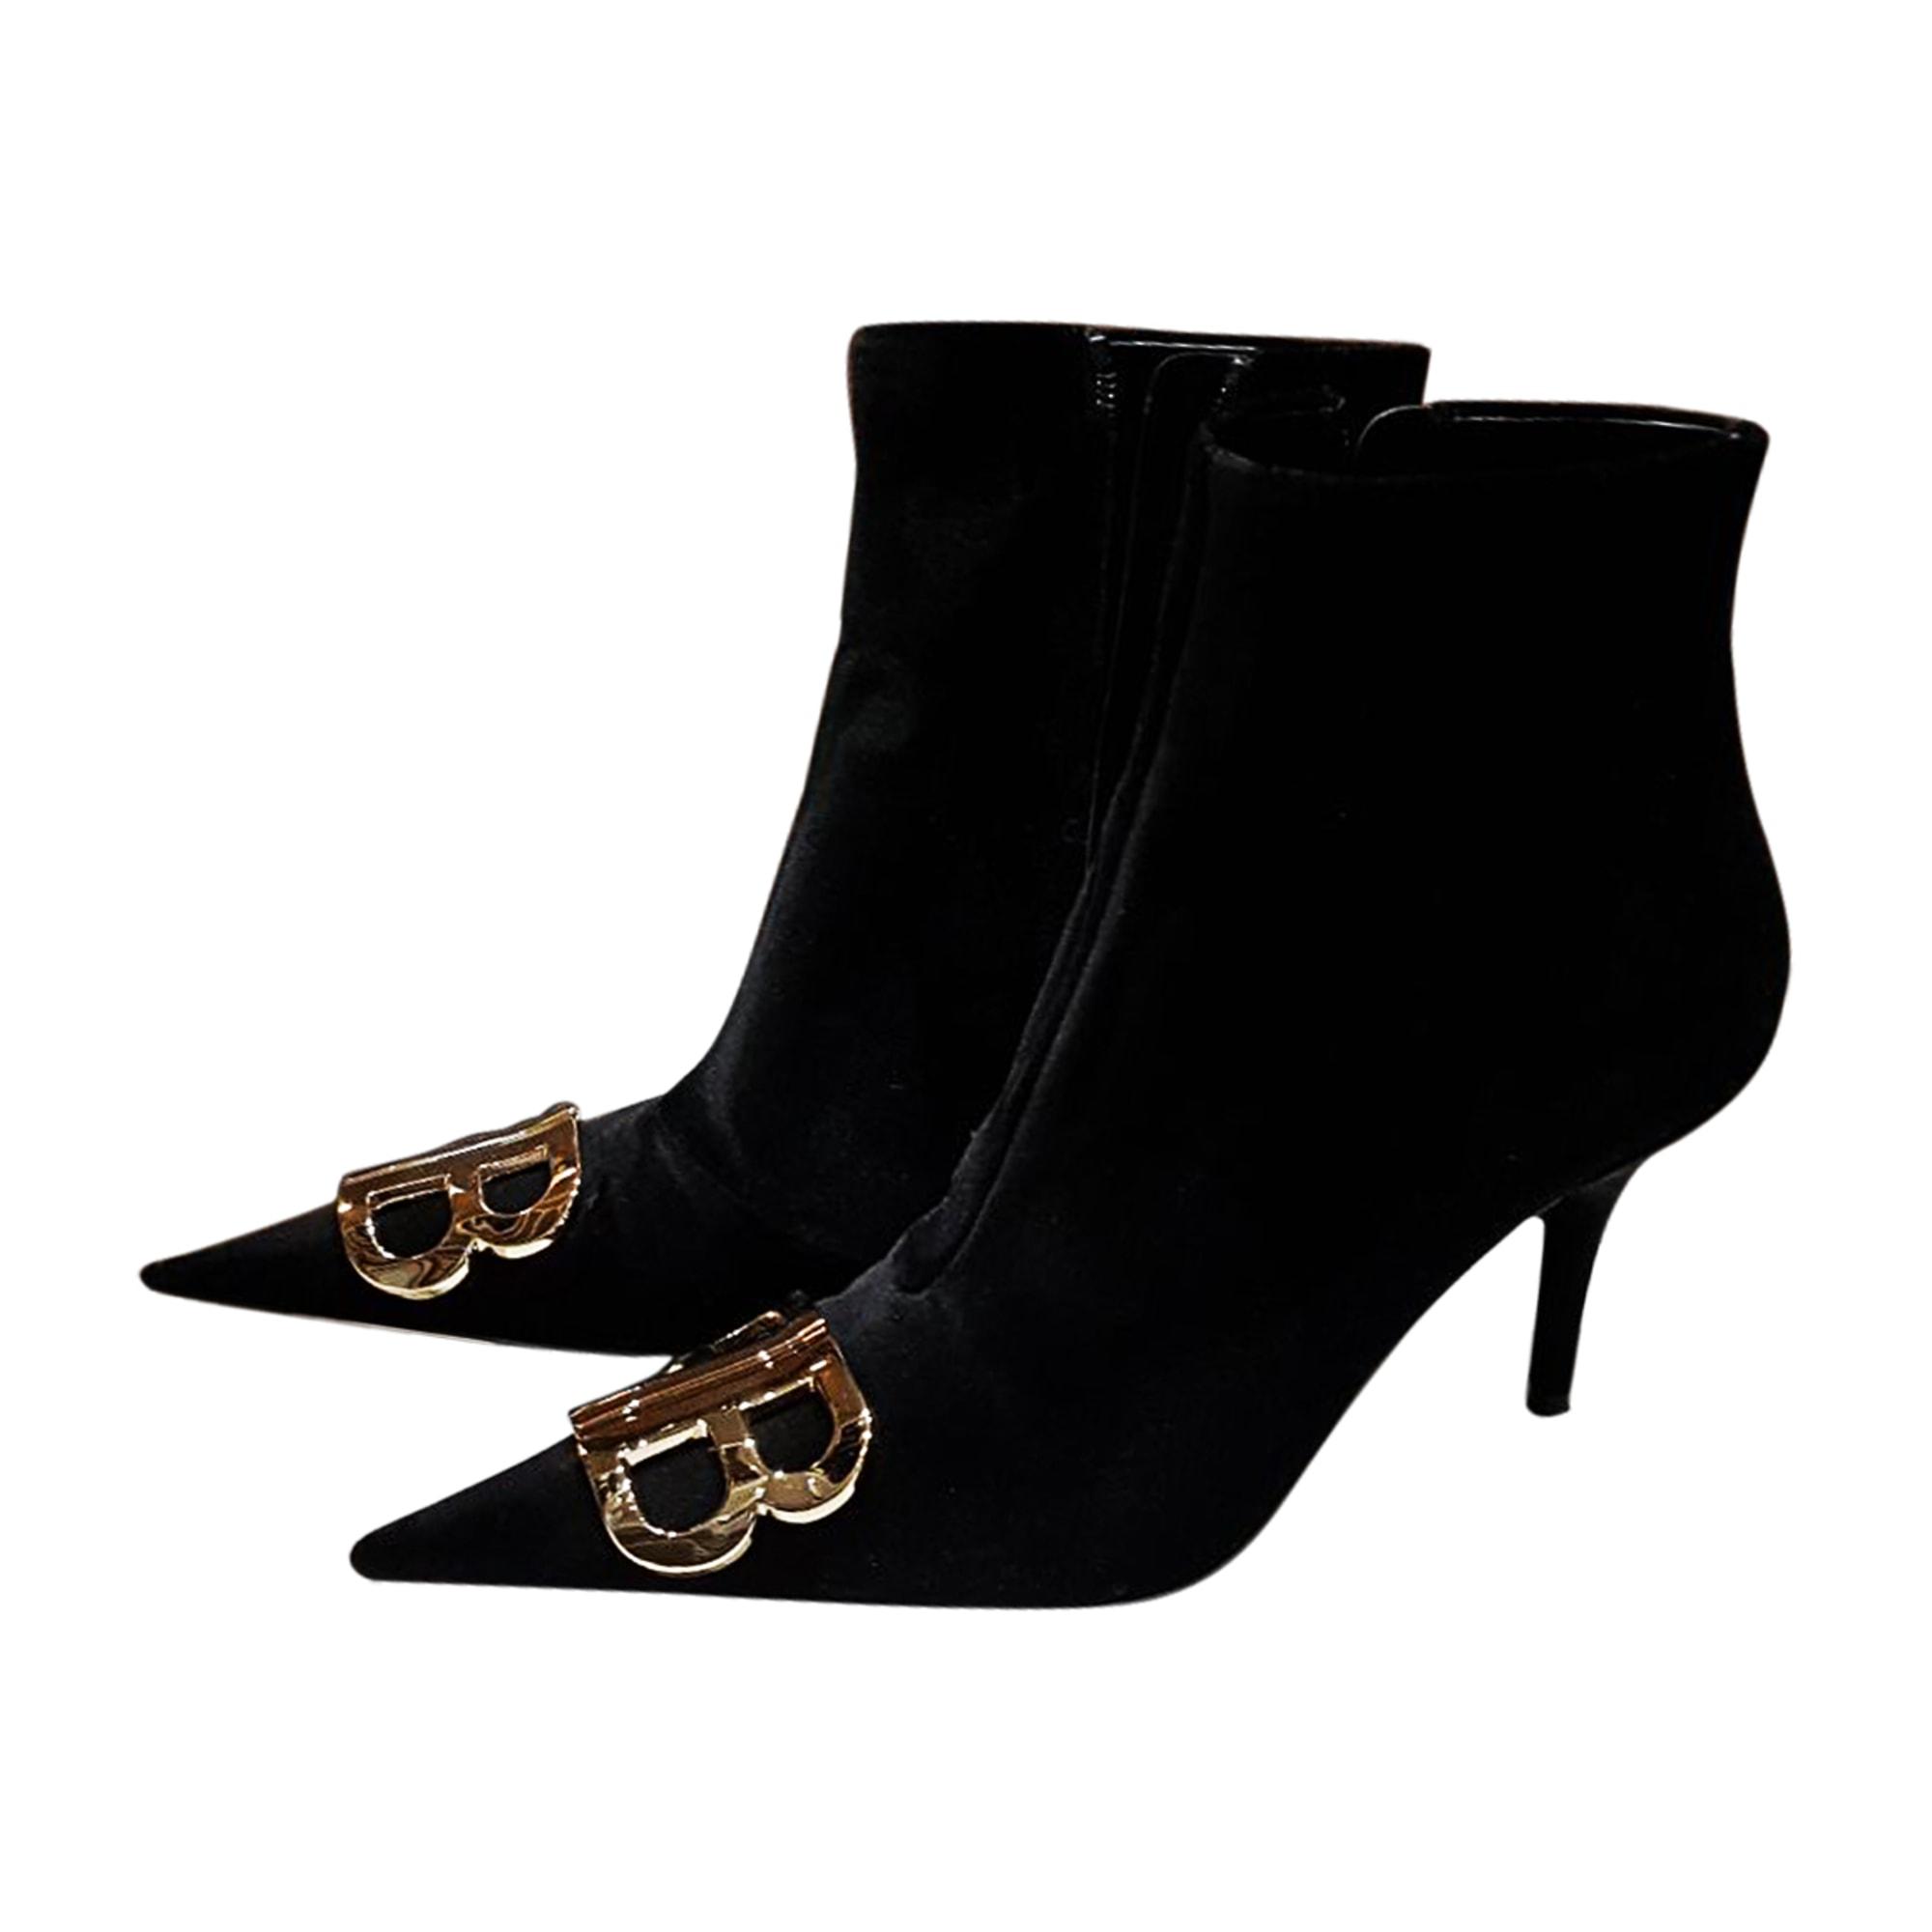 High Heel Ankle Boots BALENCIAGA Black